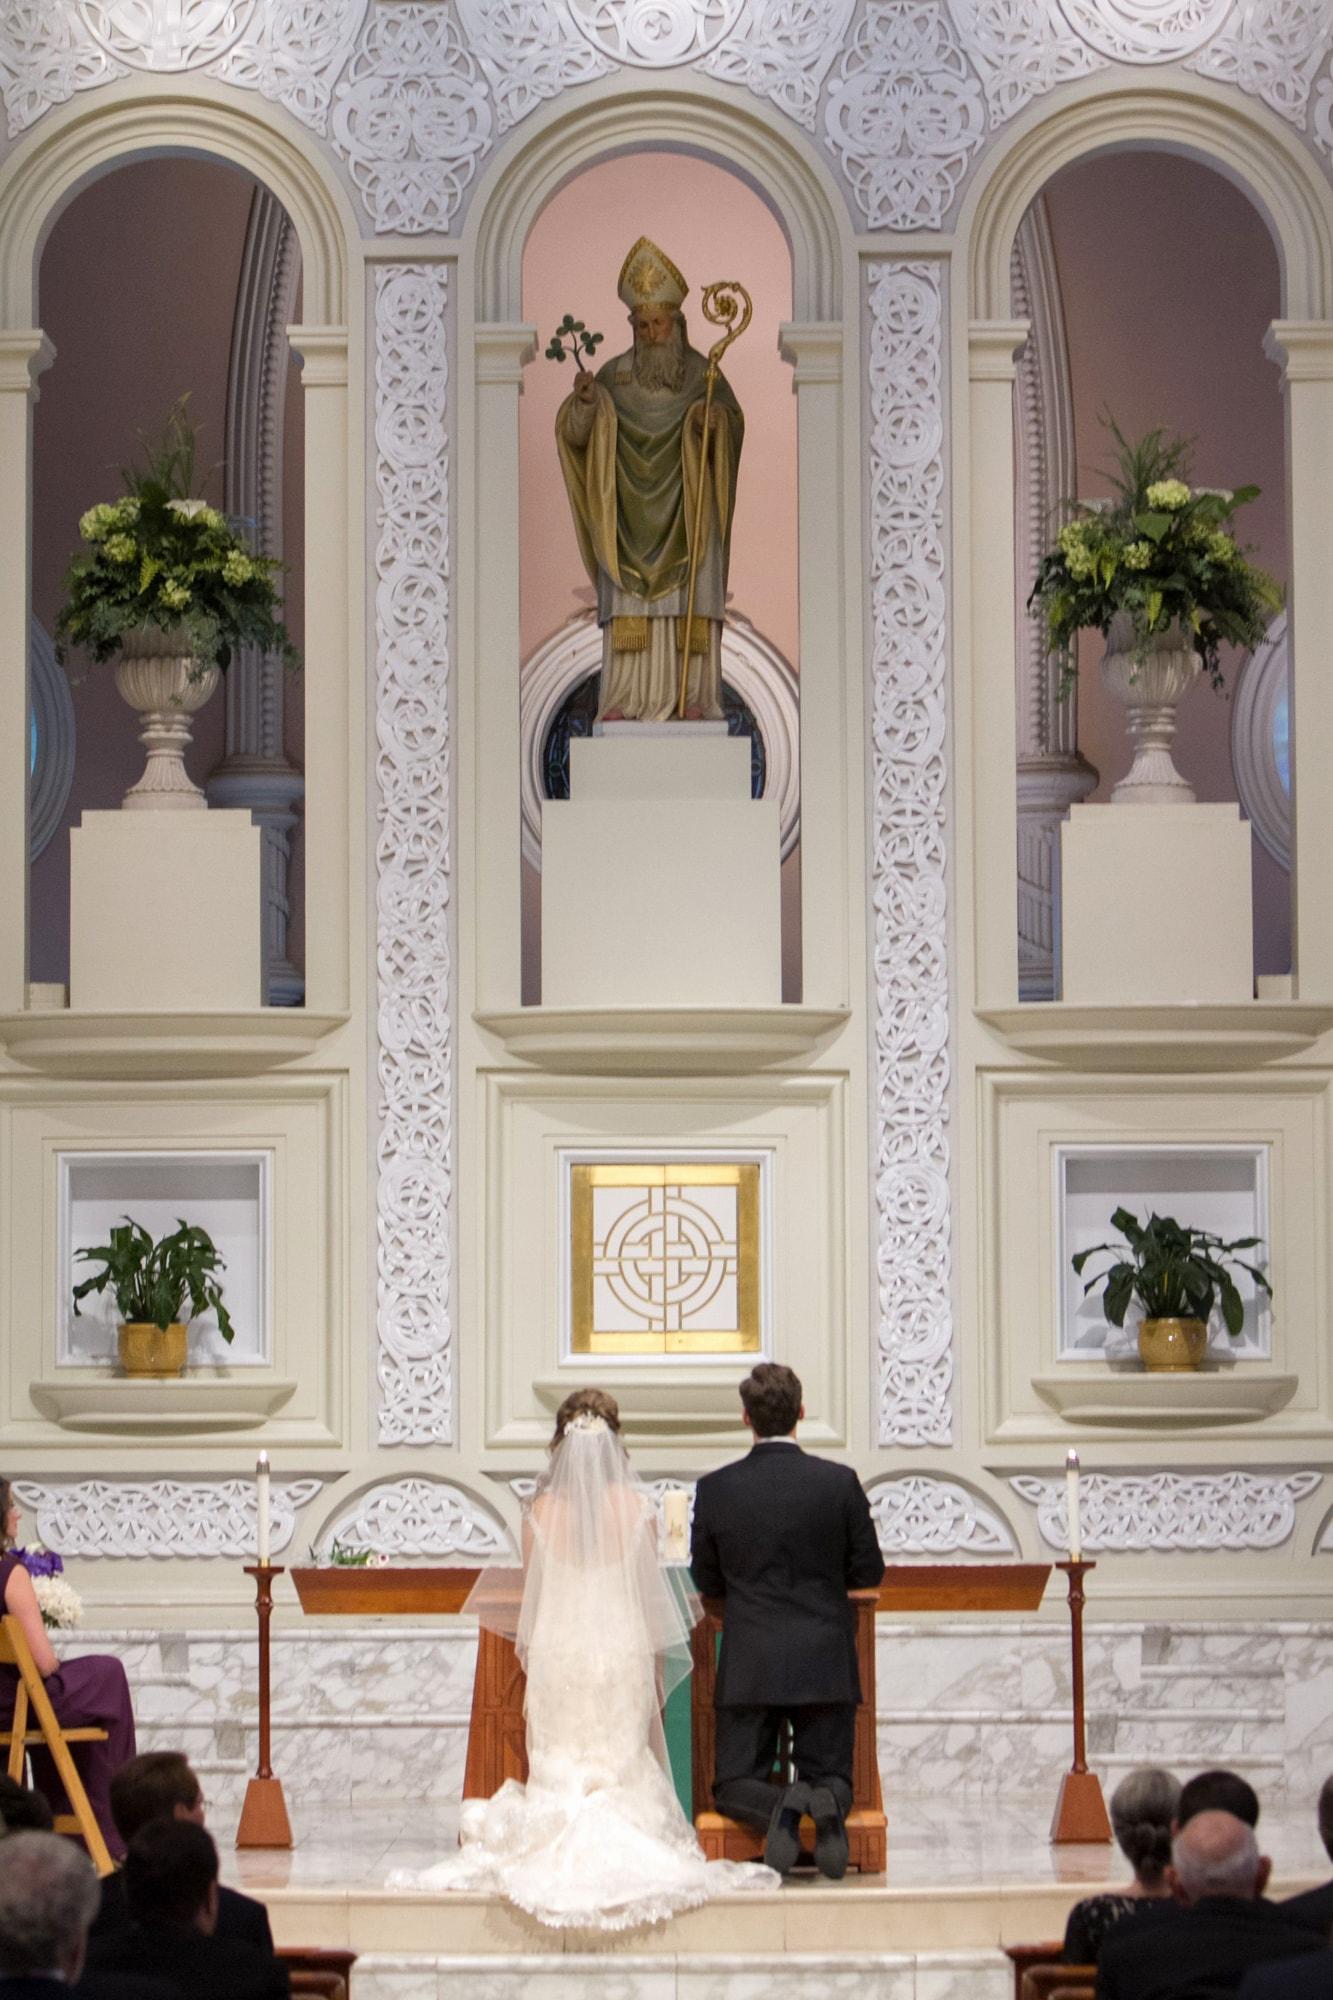 Prayer during wedding ceremony at Old St. Patricks Chicago